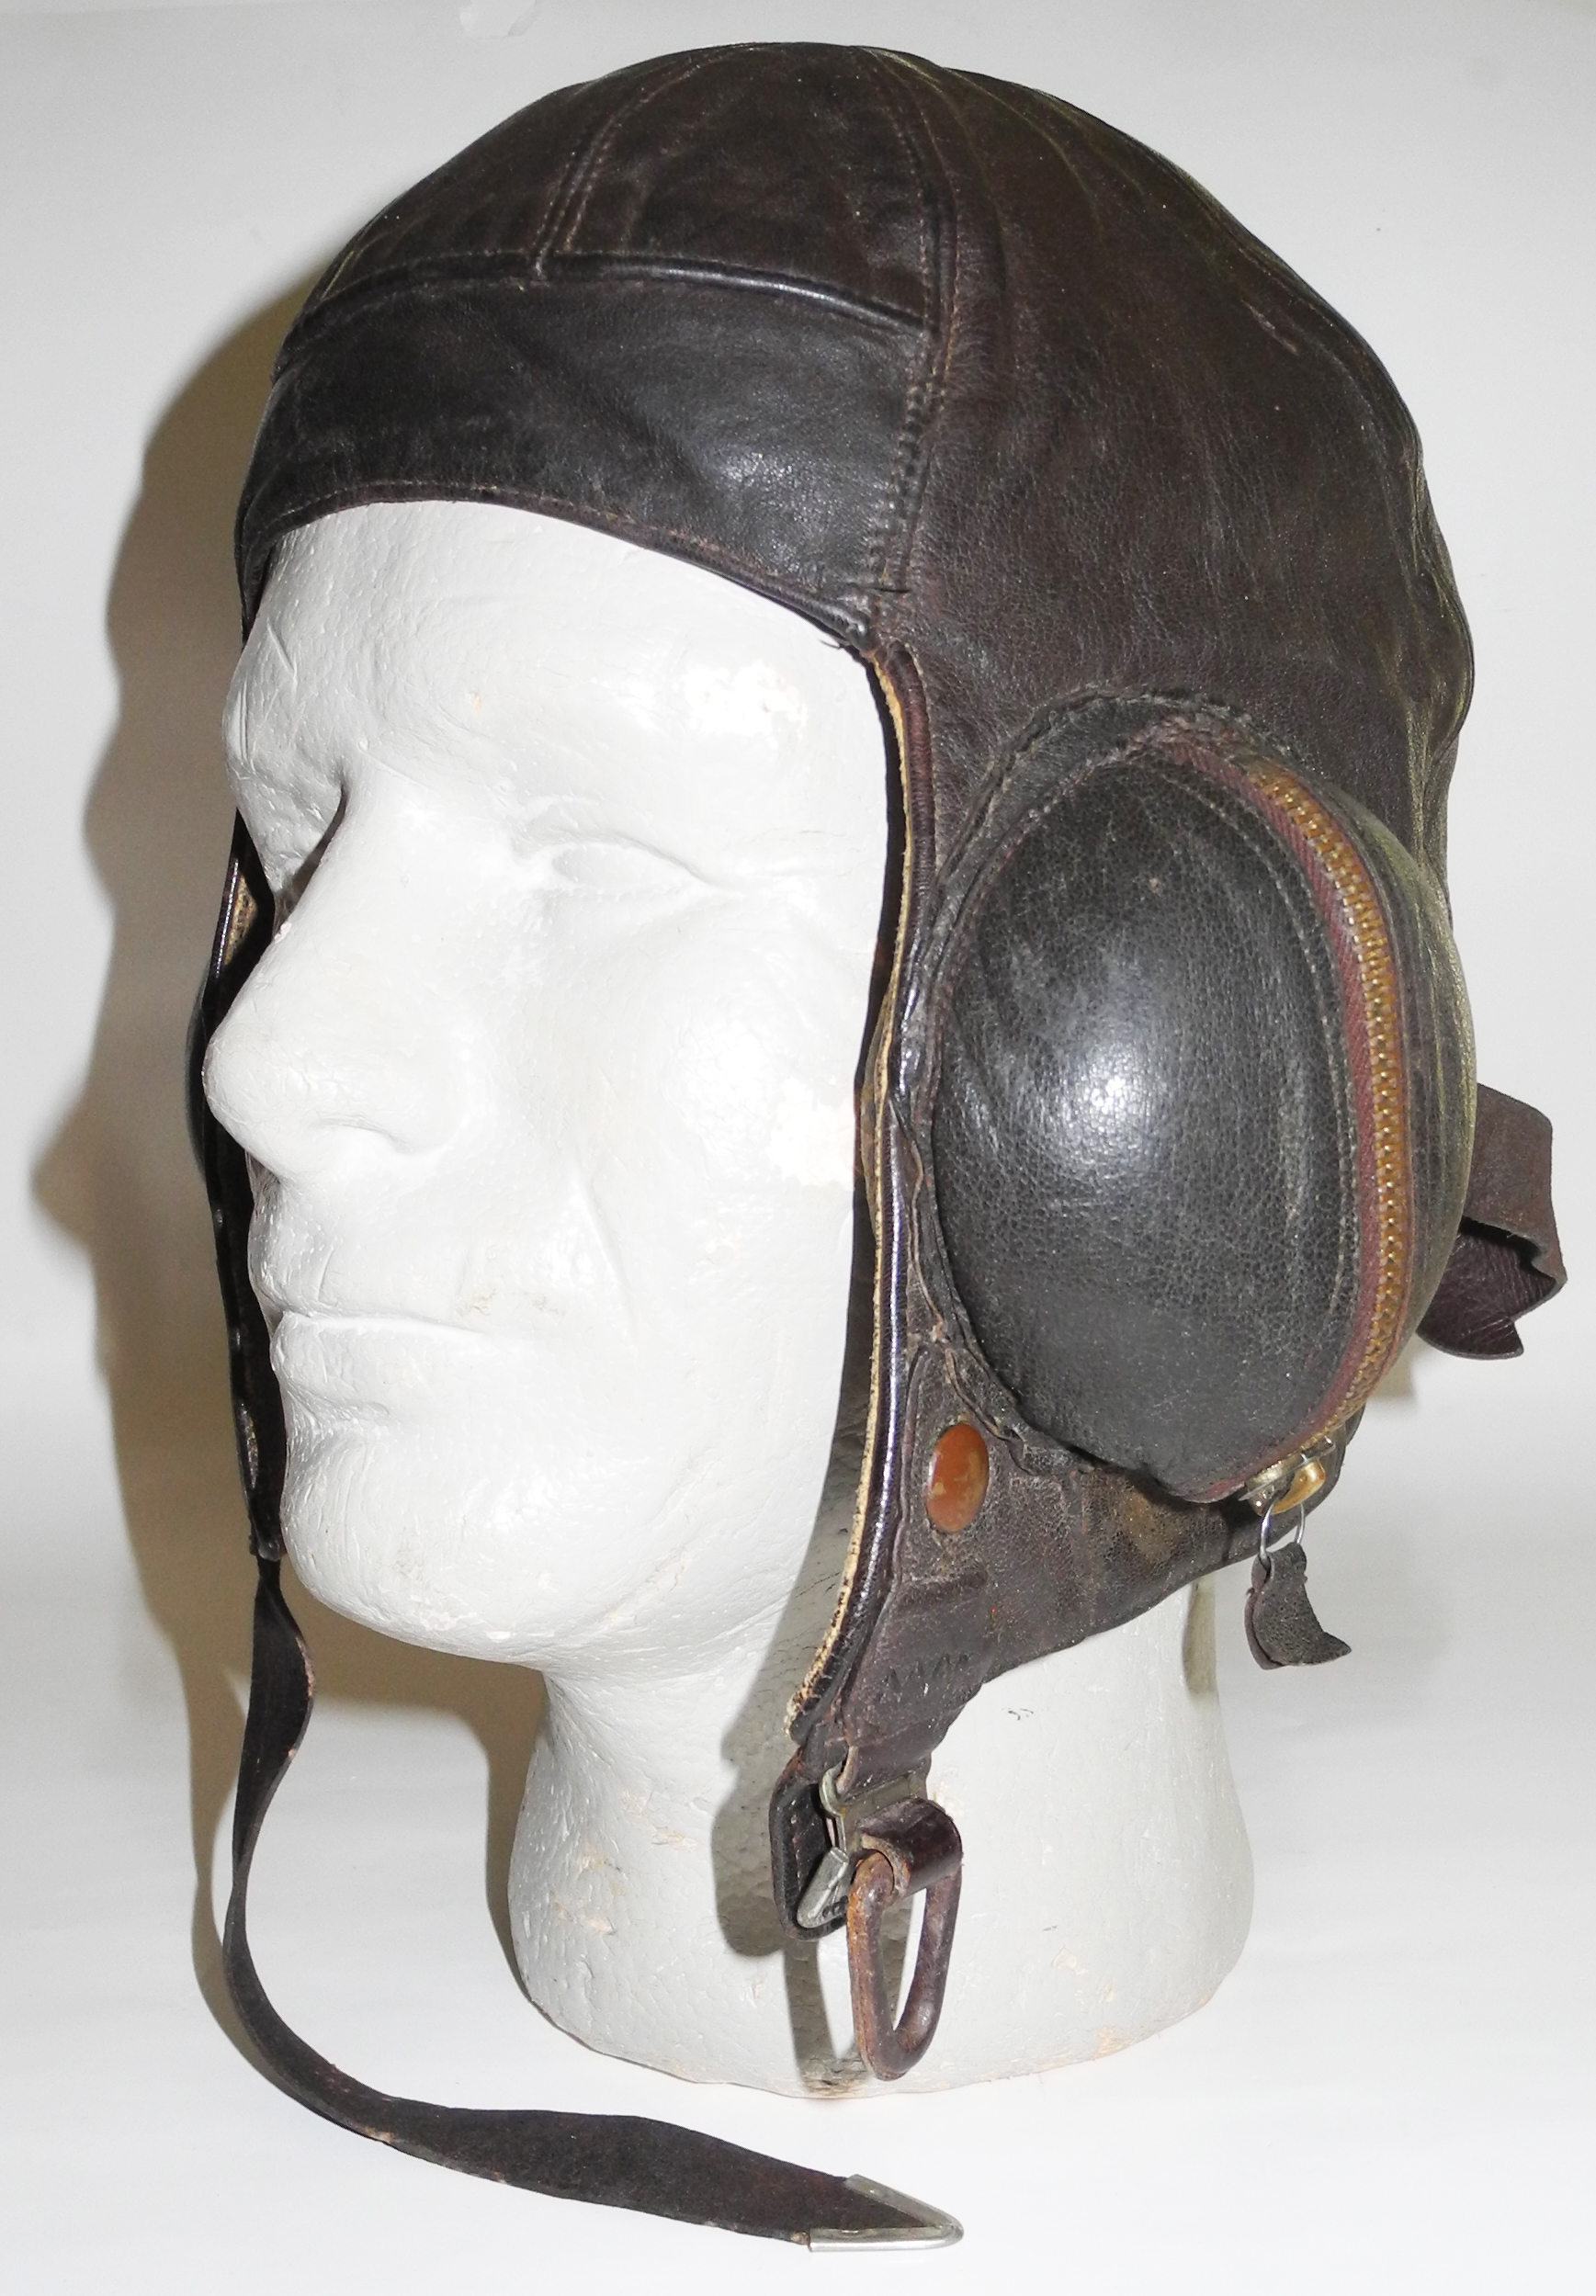 RAF Type B helmet, Frank Bryan, 1940 dated, size 2